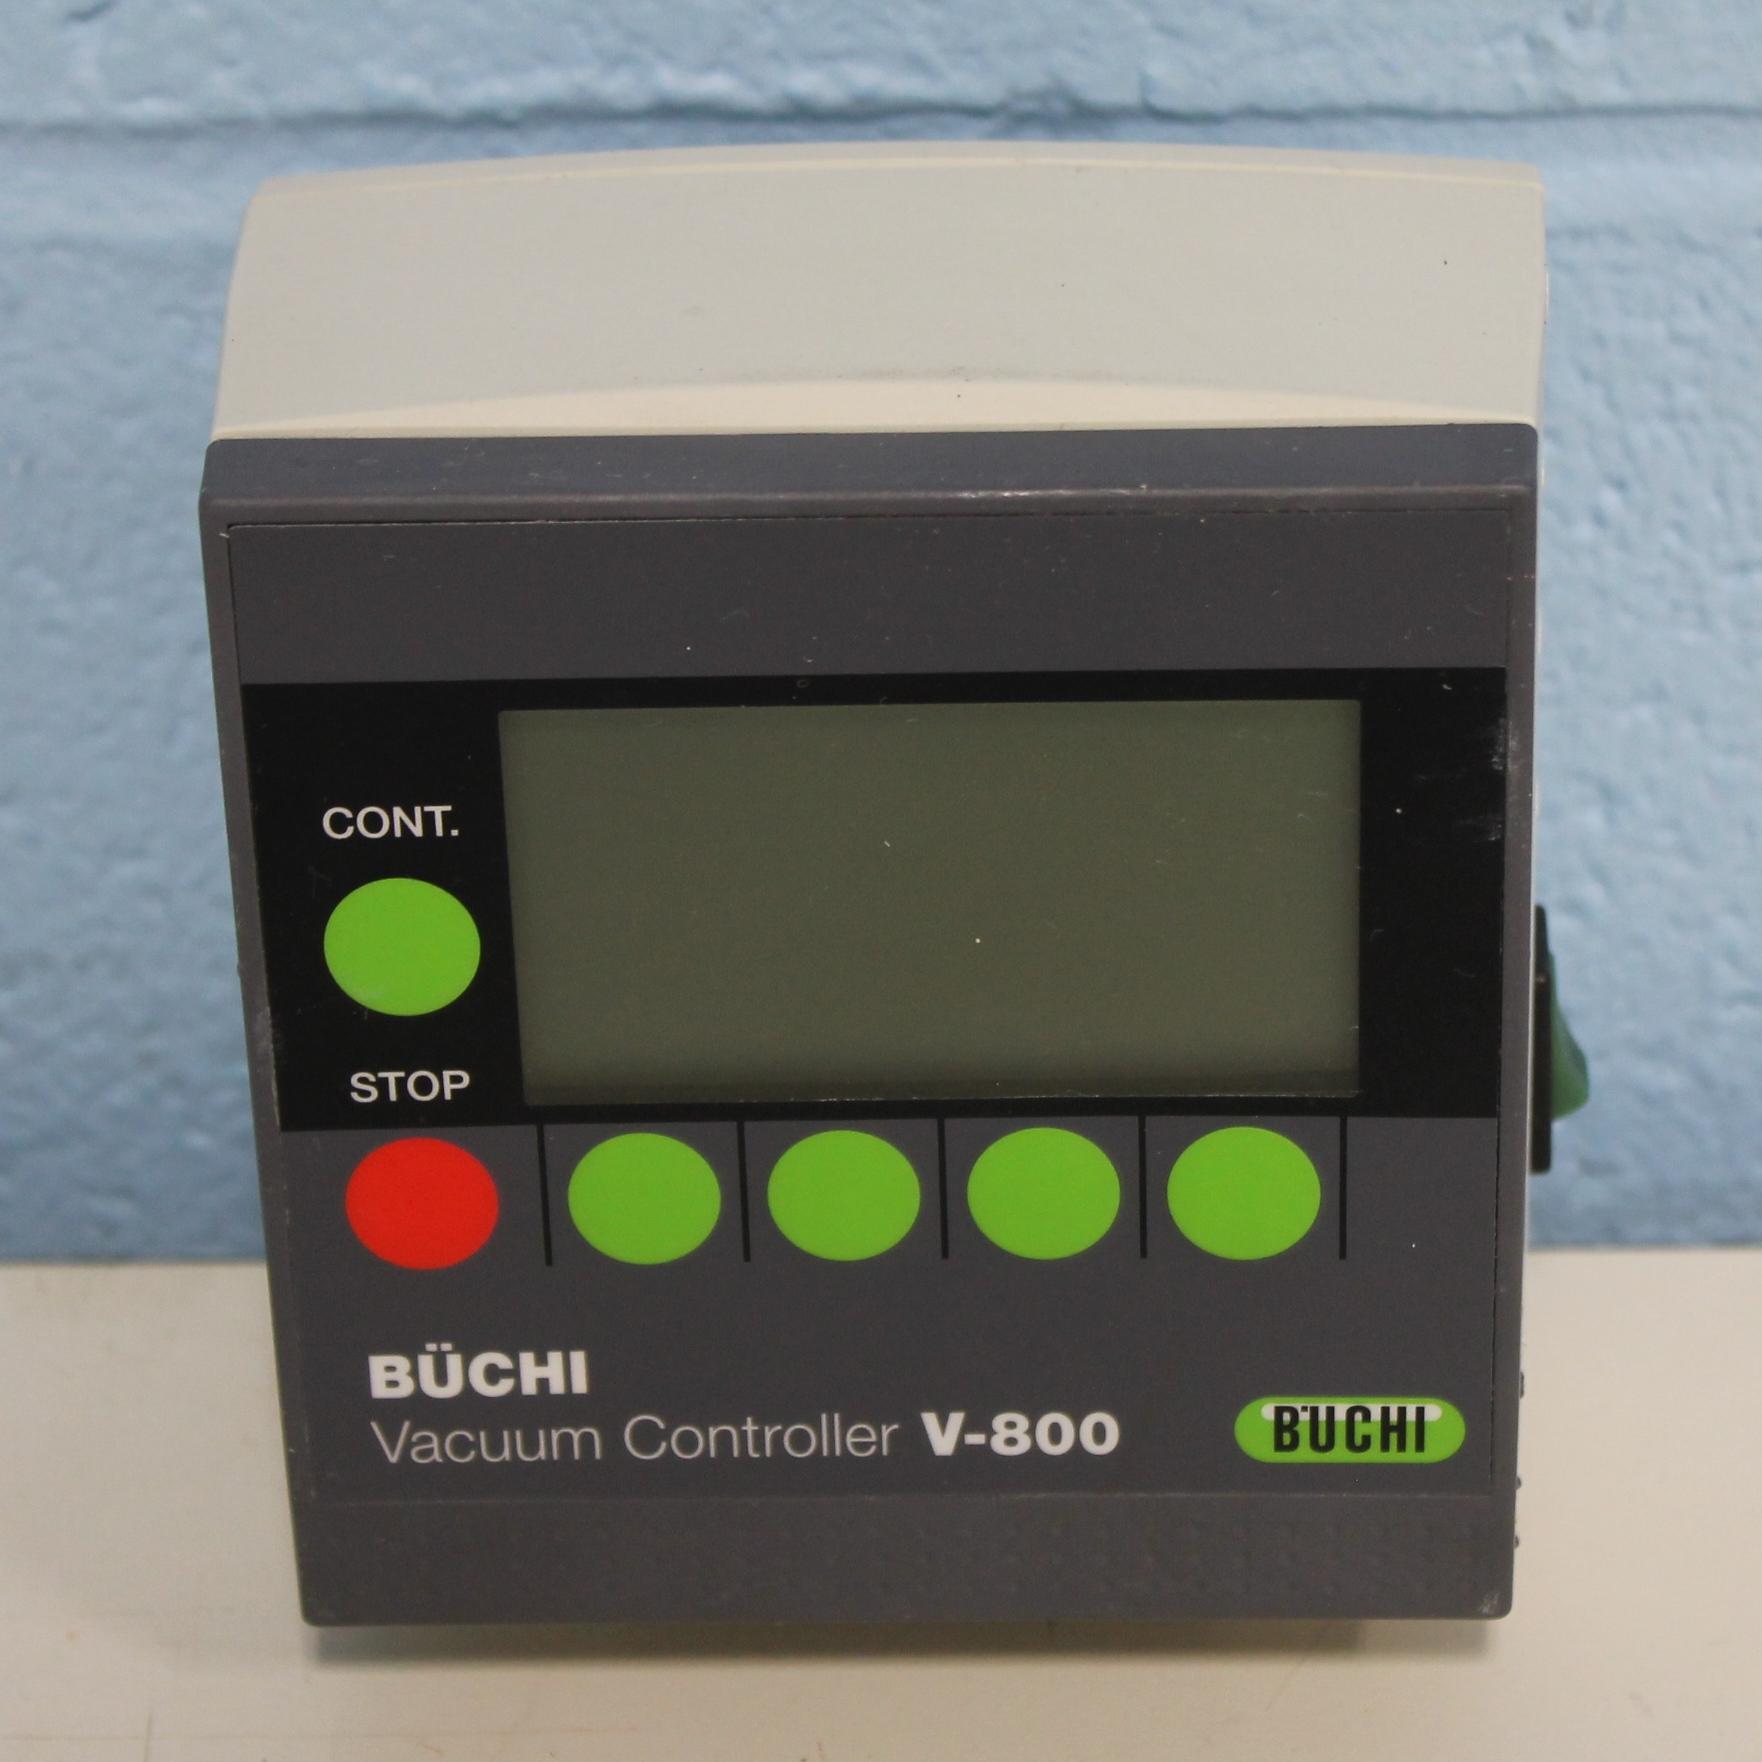 V-800 Vacuum Controller Name